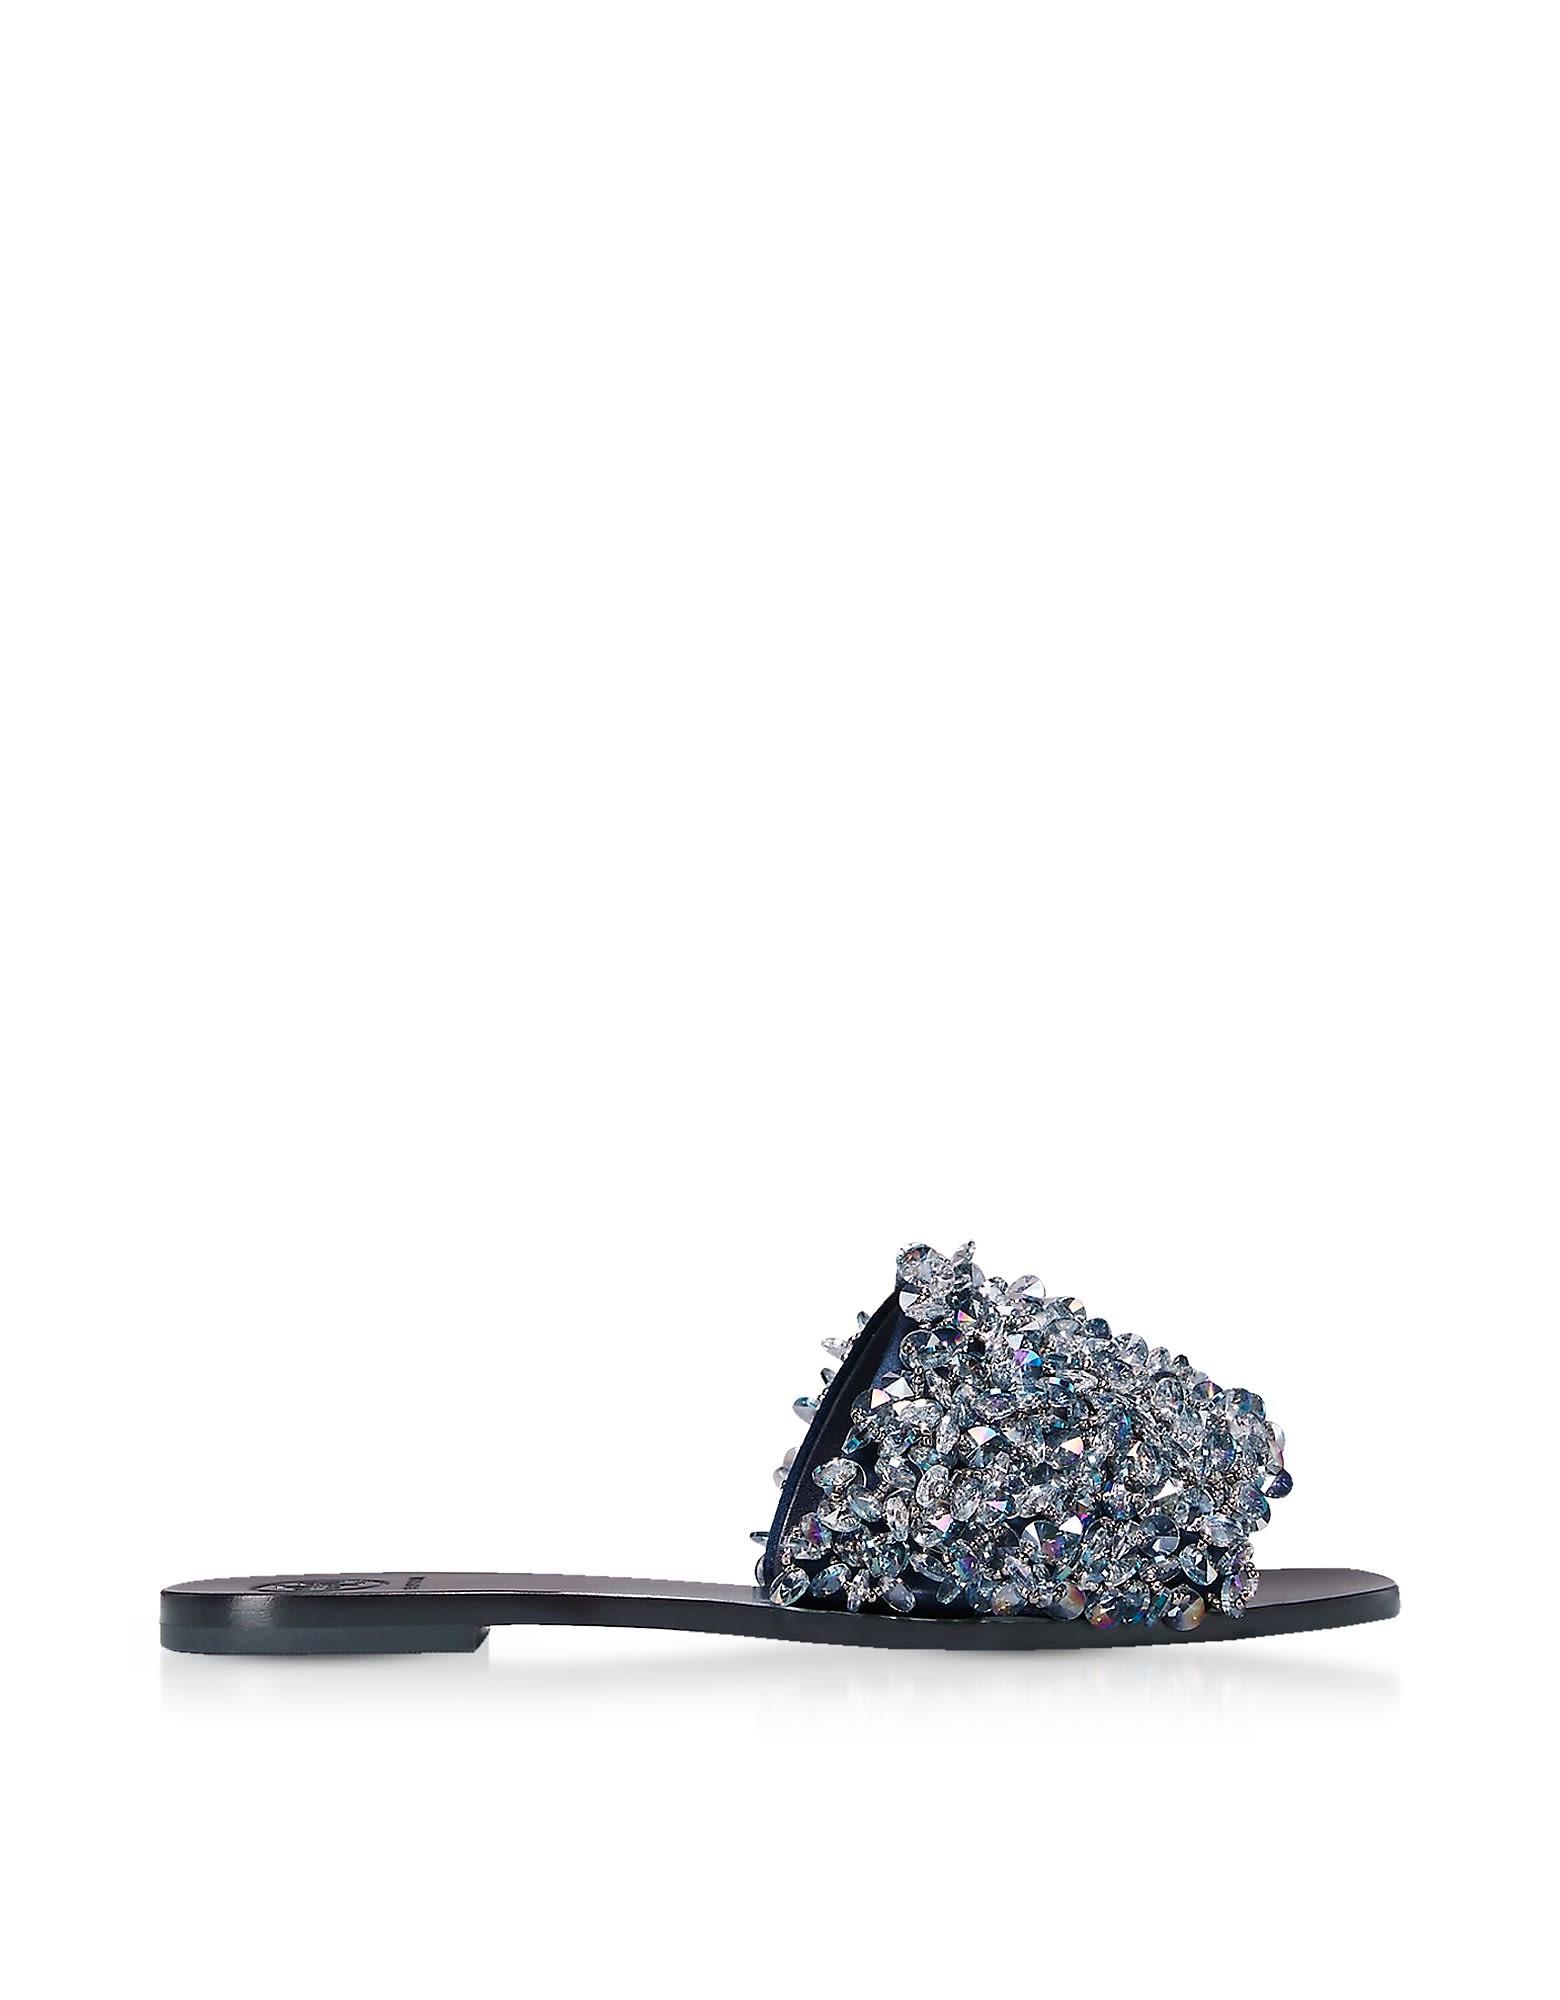 Tory Burch Designer Shoes, Logan Perfect Navy Satin Slide Sandals w/ Crystals